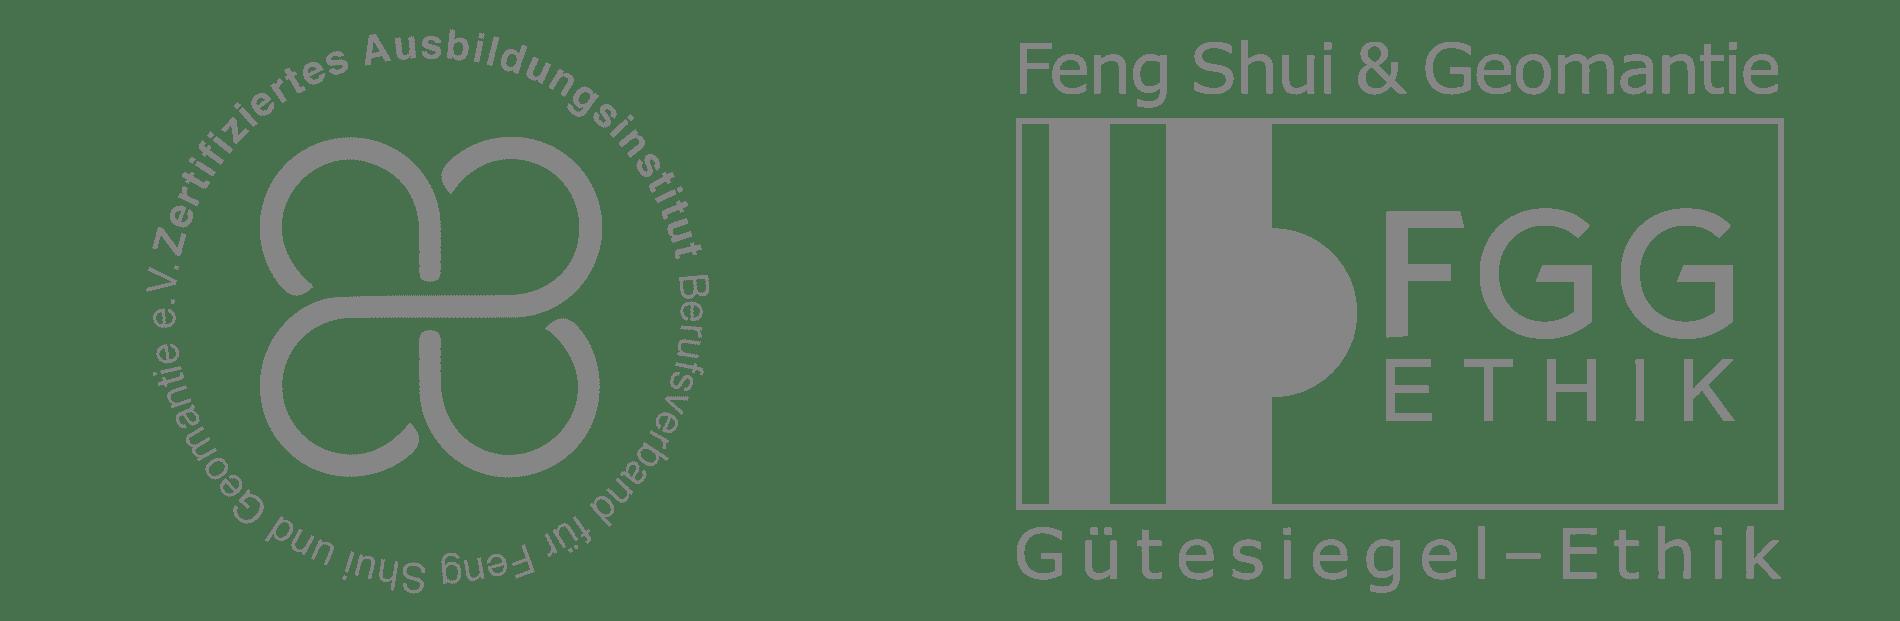 Feng Shui Akademie impressum internationale feng shui akademie